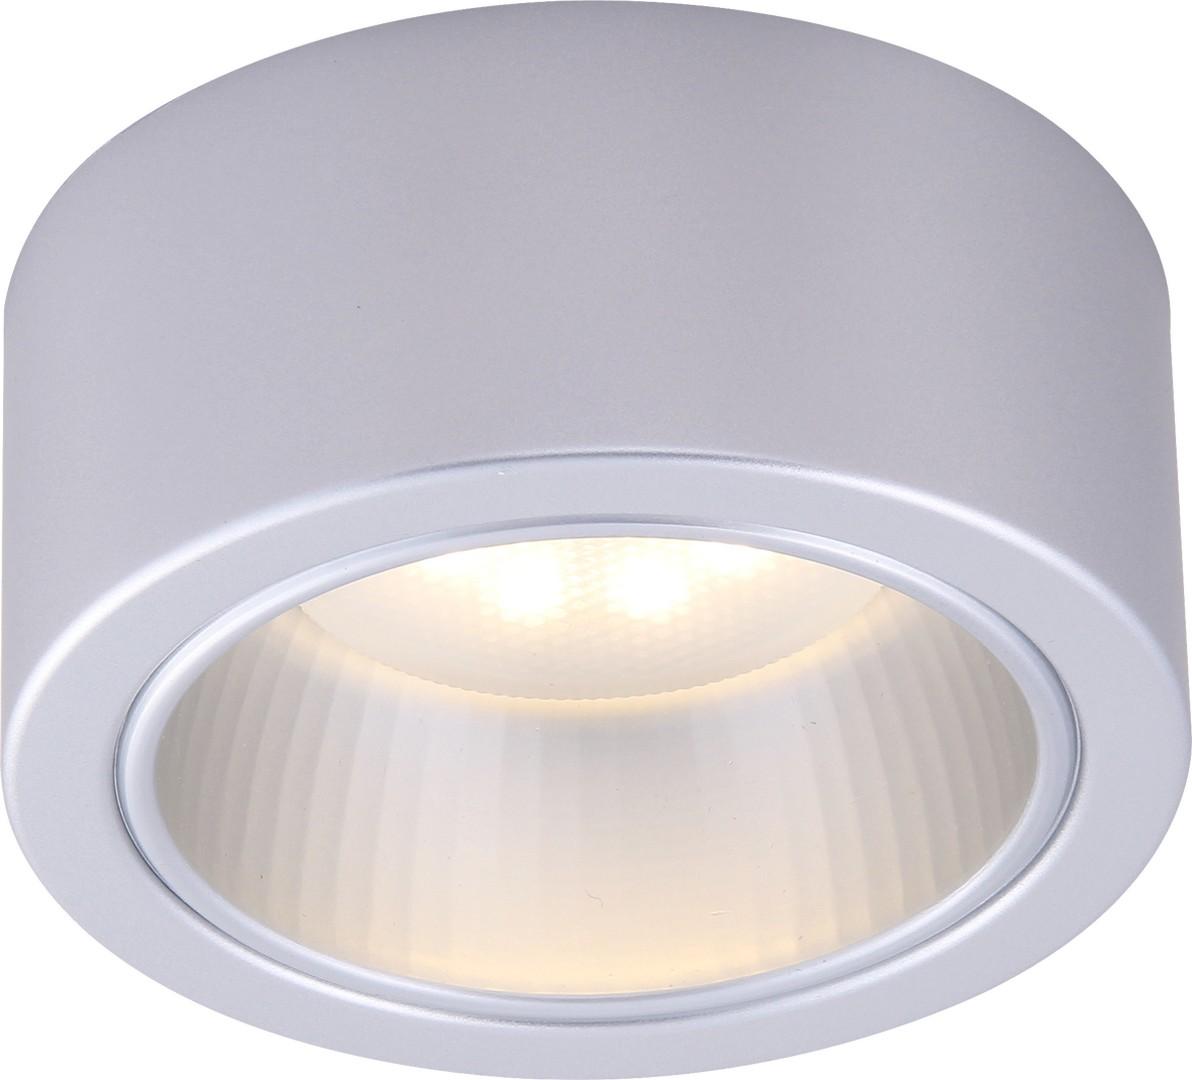 A5553PL-1GY Накладной светильник EFFETTO 1x11W, 1xGX53 Arte Lamp